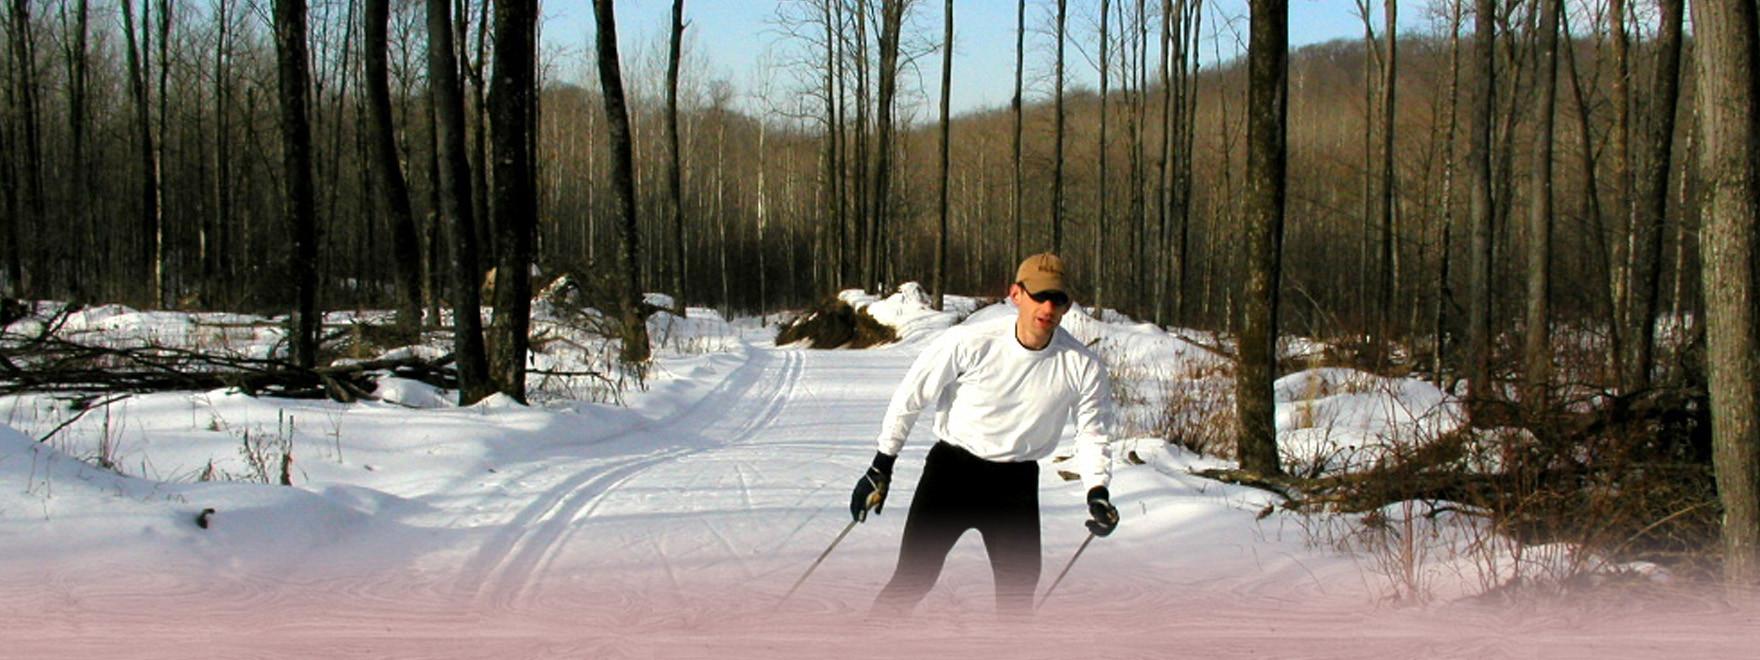 skiing211